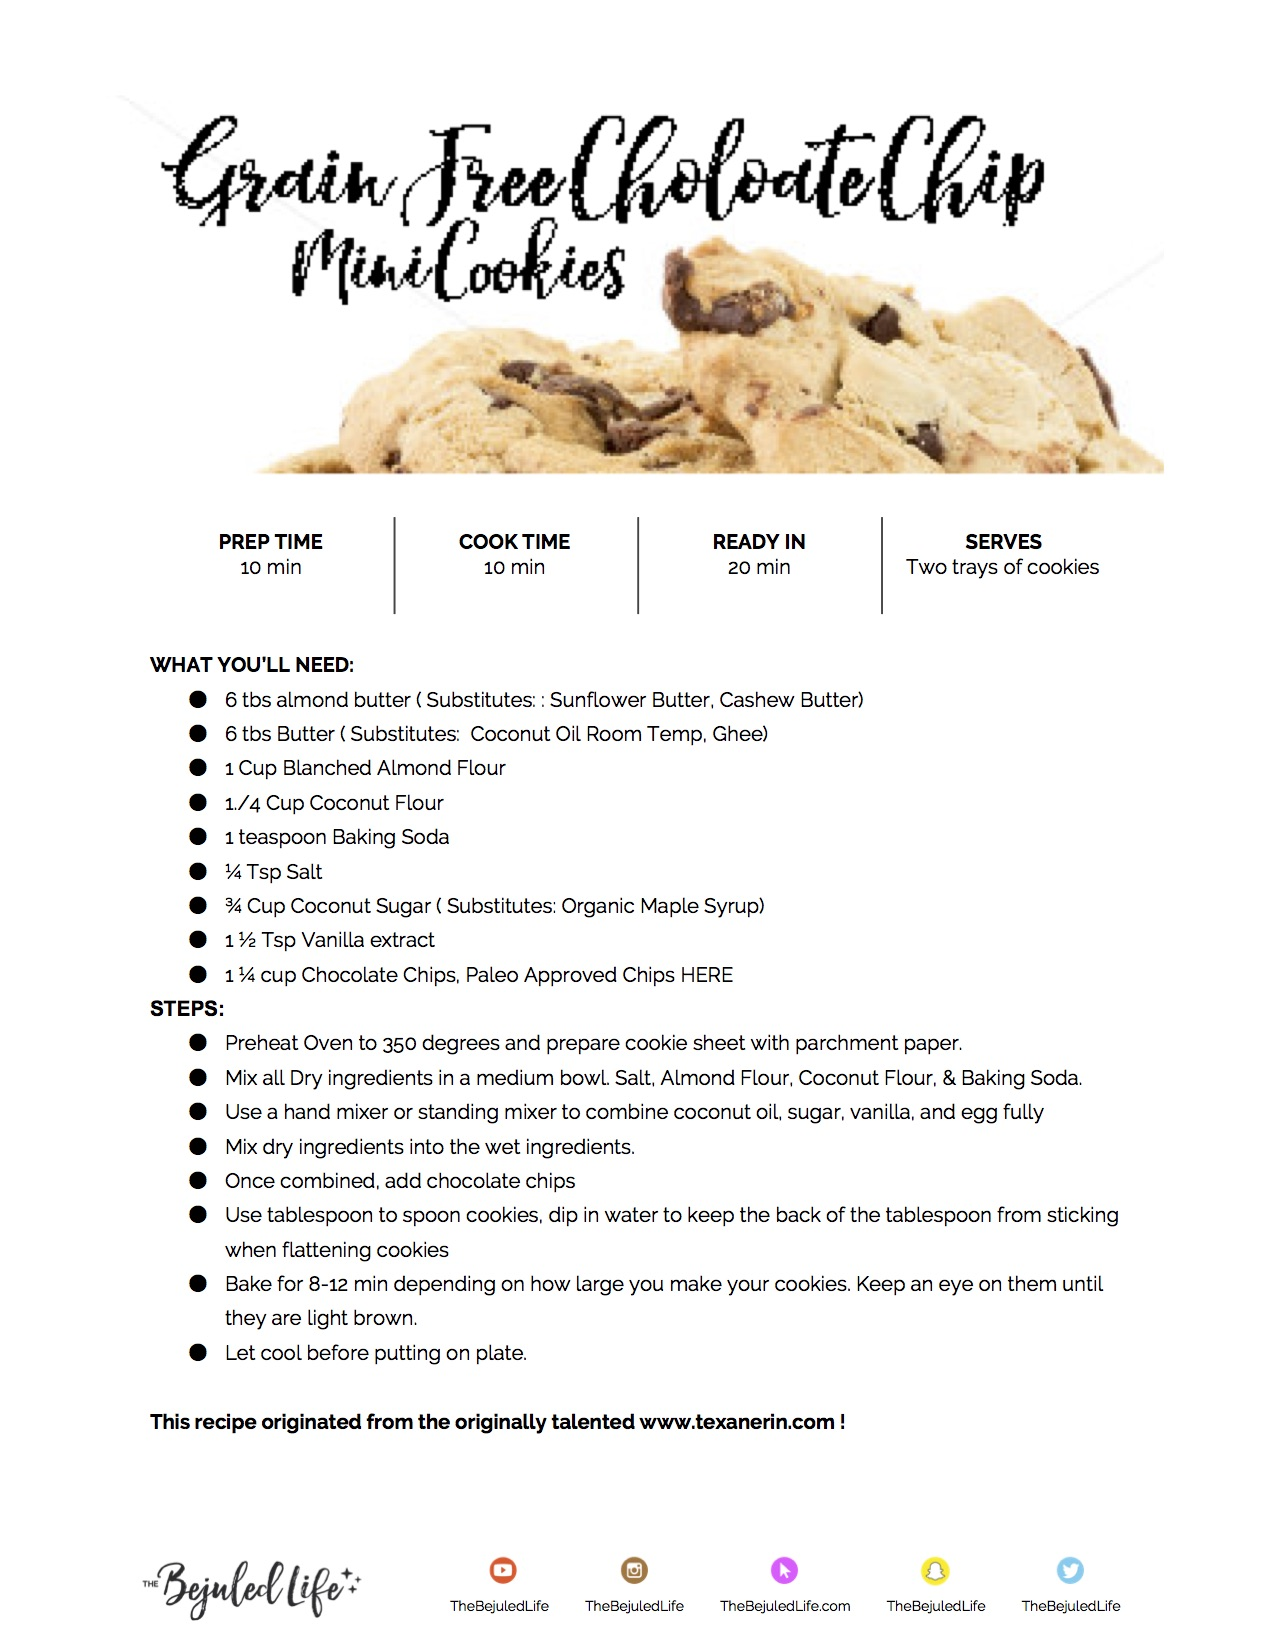 chocochipcookies-2.jpg